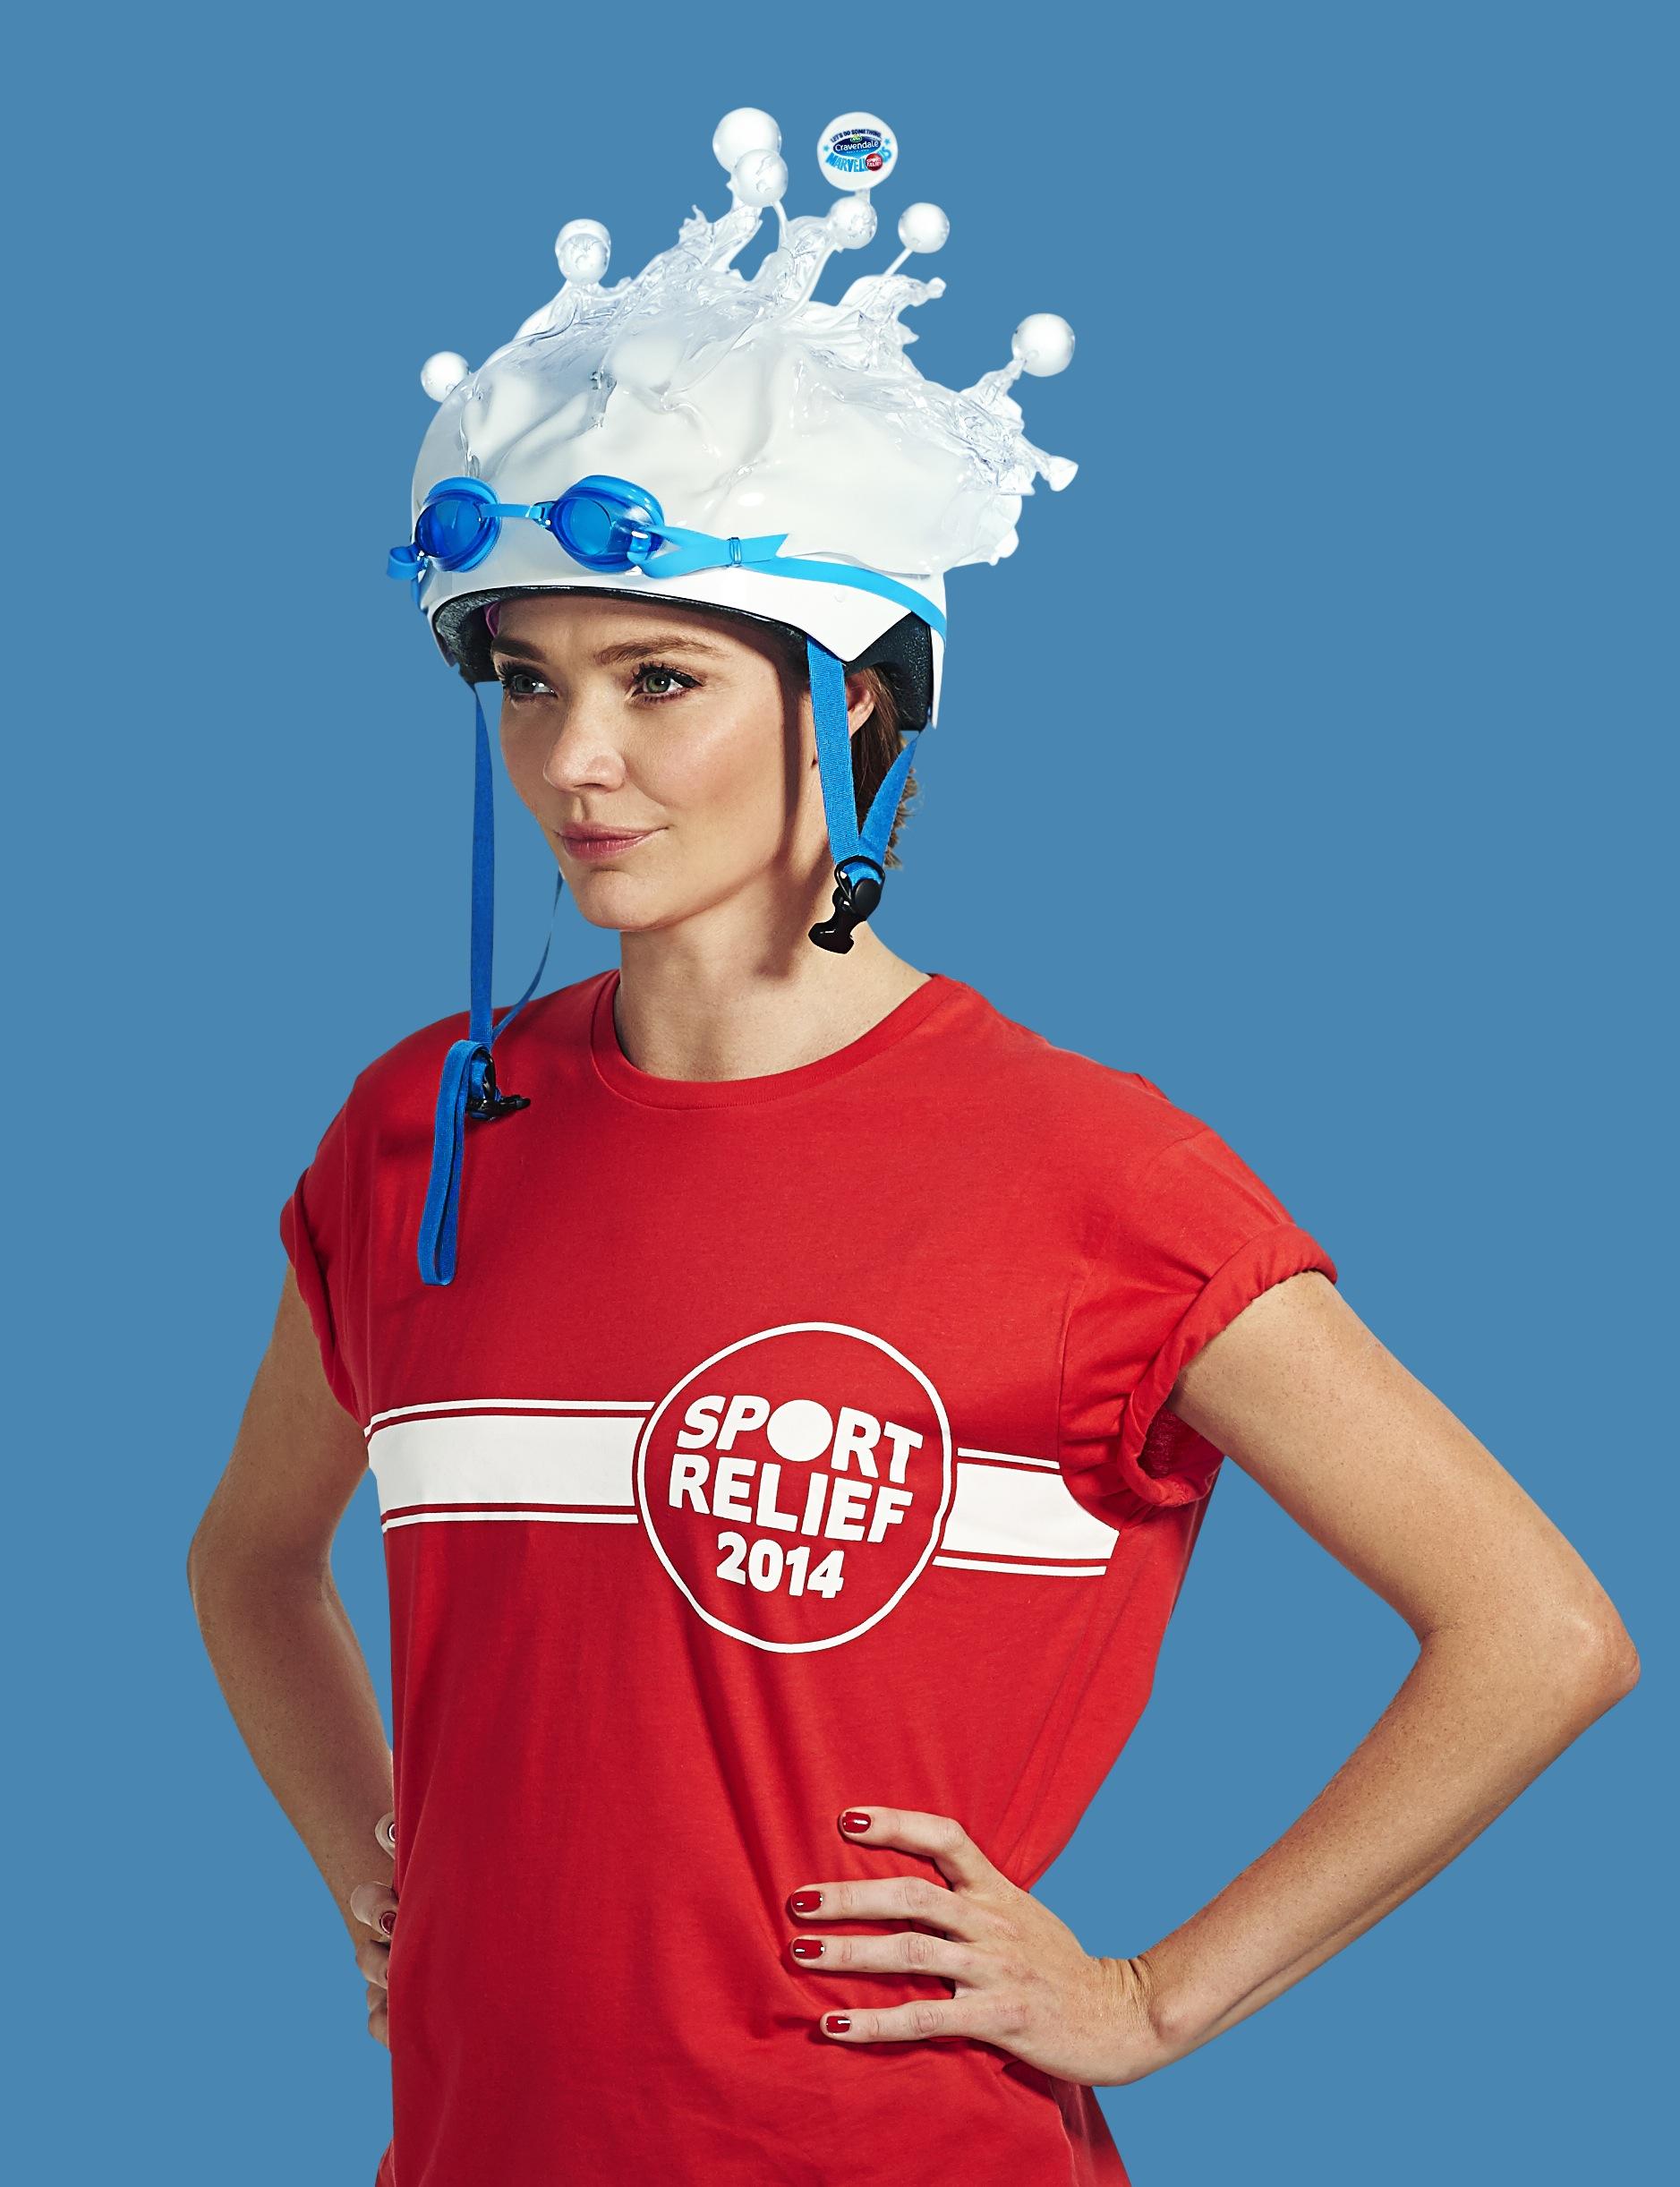 Marvellous milliner creates high fashion cycle helmets